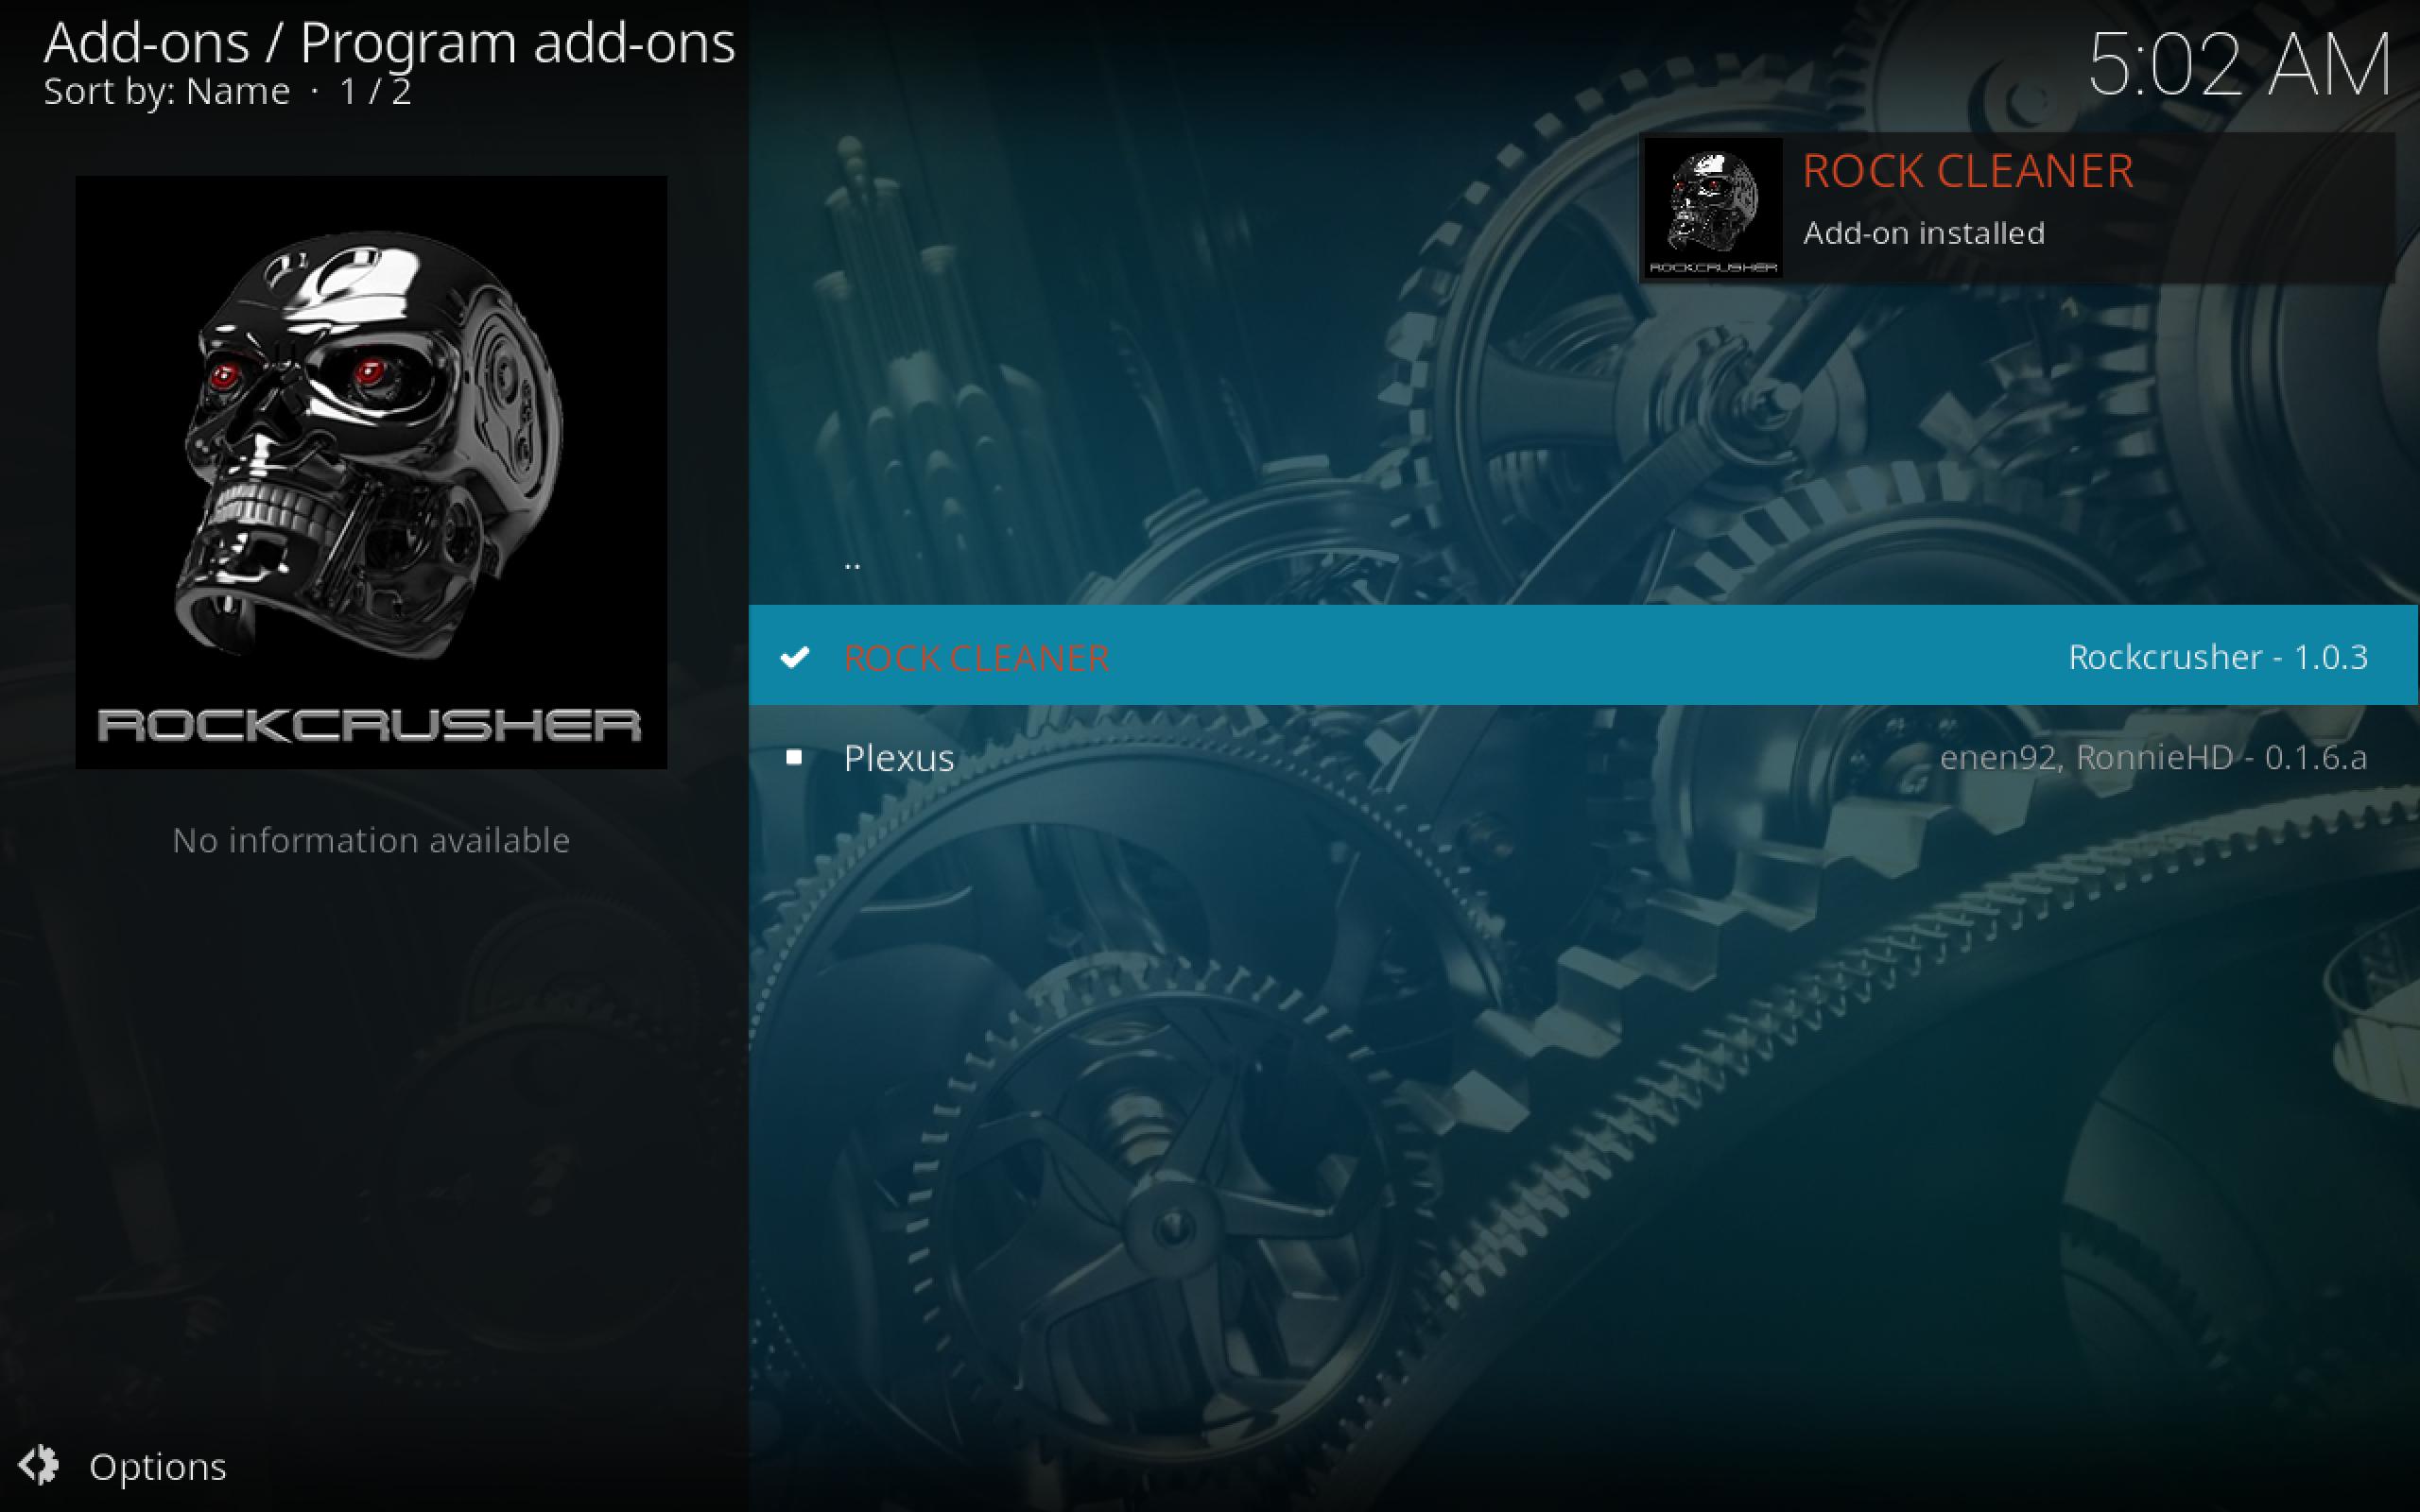 Rock Cleaner Kodi Add-on Installed